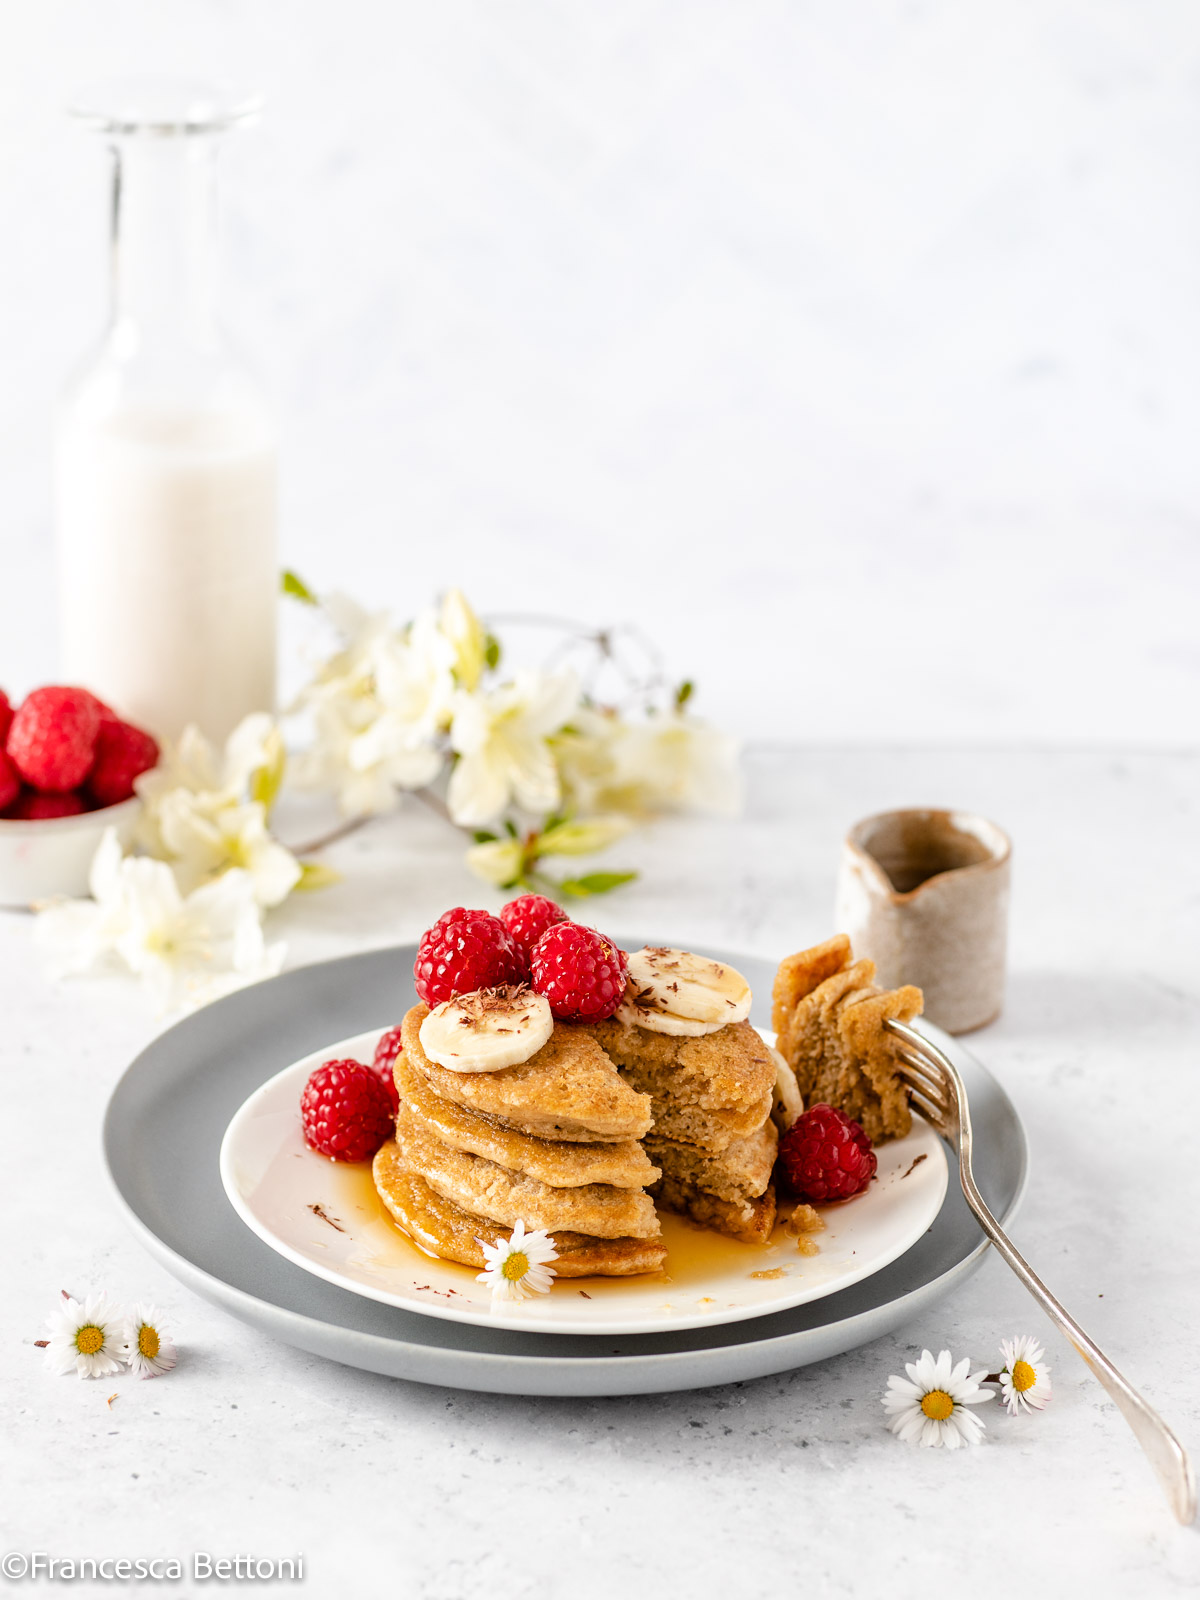 ricetta PANCAKES LIGHT senza uova senza glutine vegan gluten-free oatmeal pancakes recipe